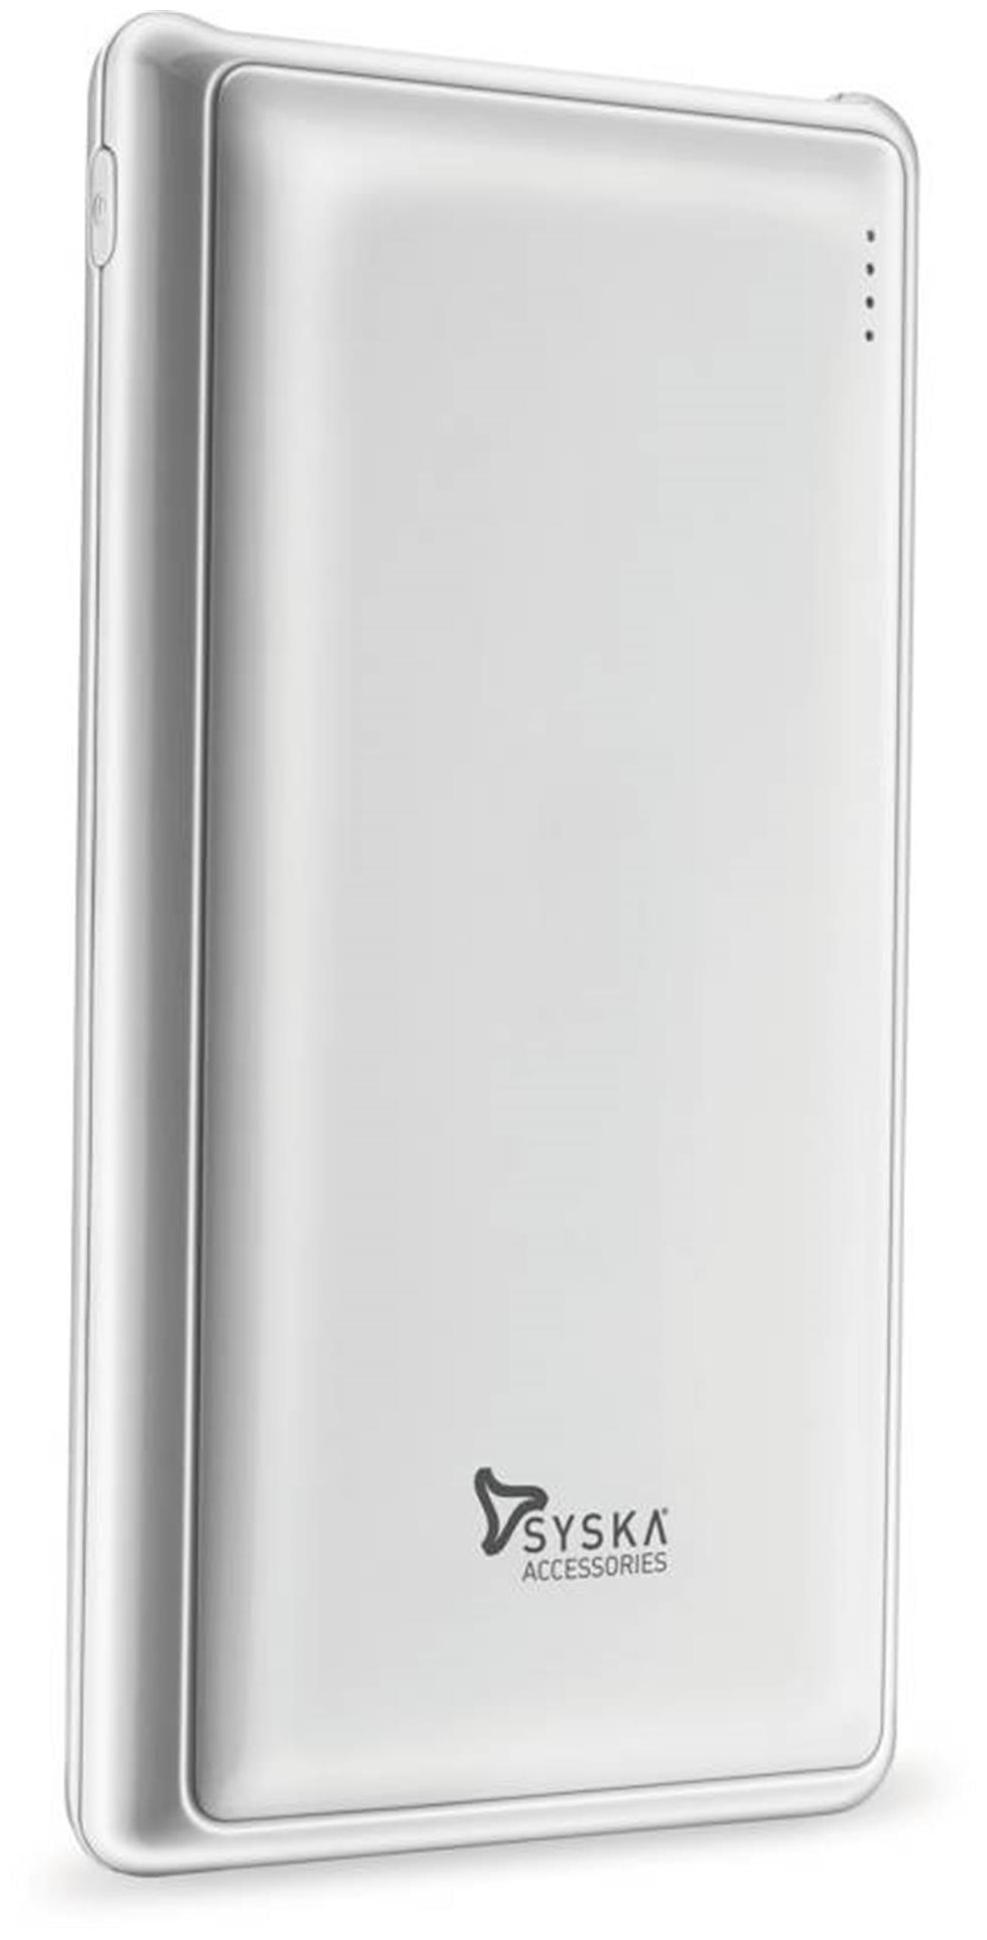 Syska Power Pro 200 20000 mAh Power Bank   White by Electrop Store